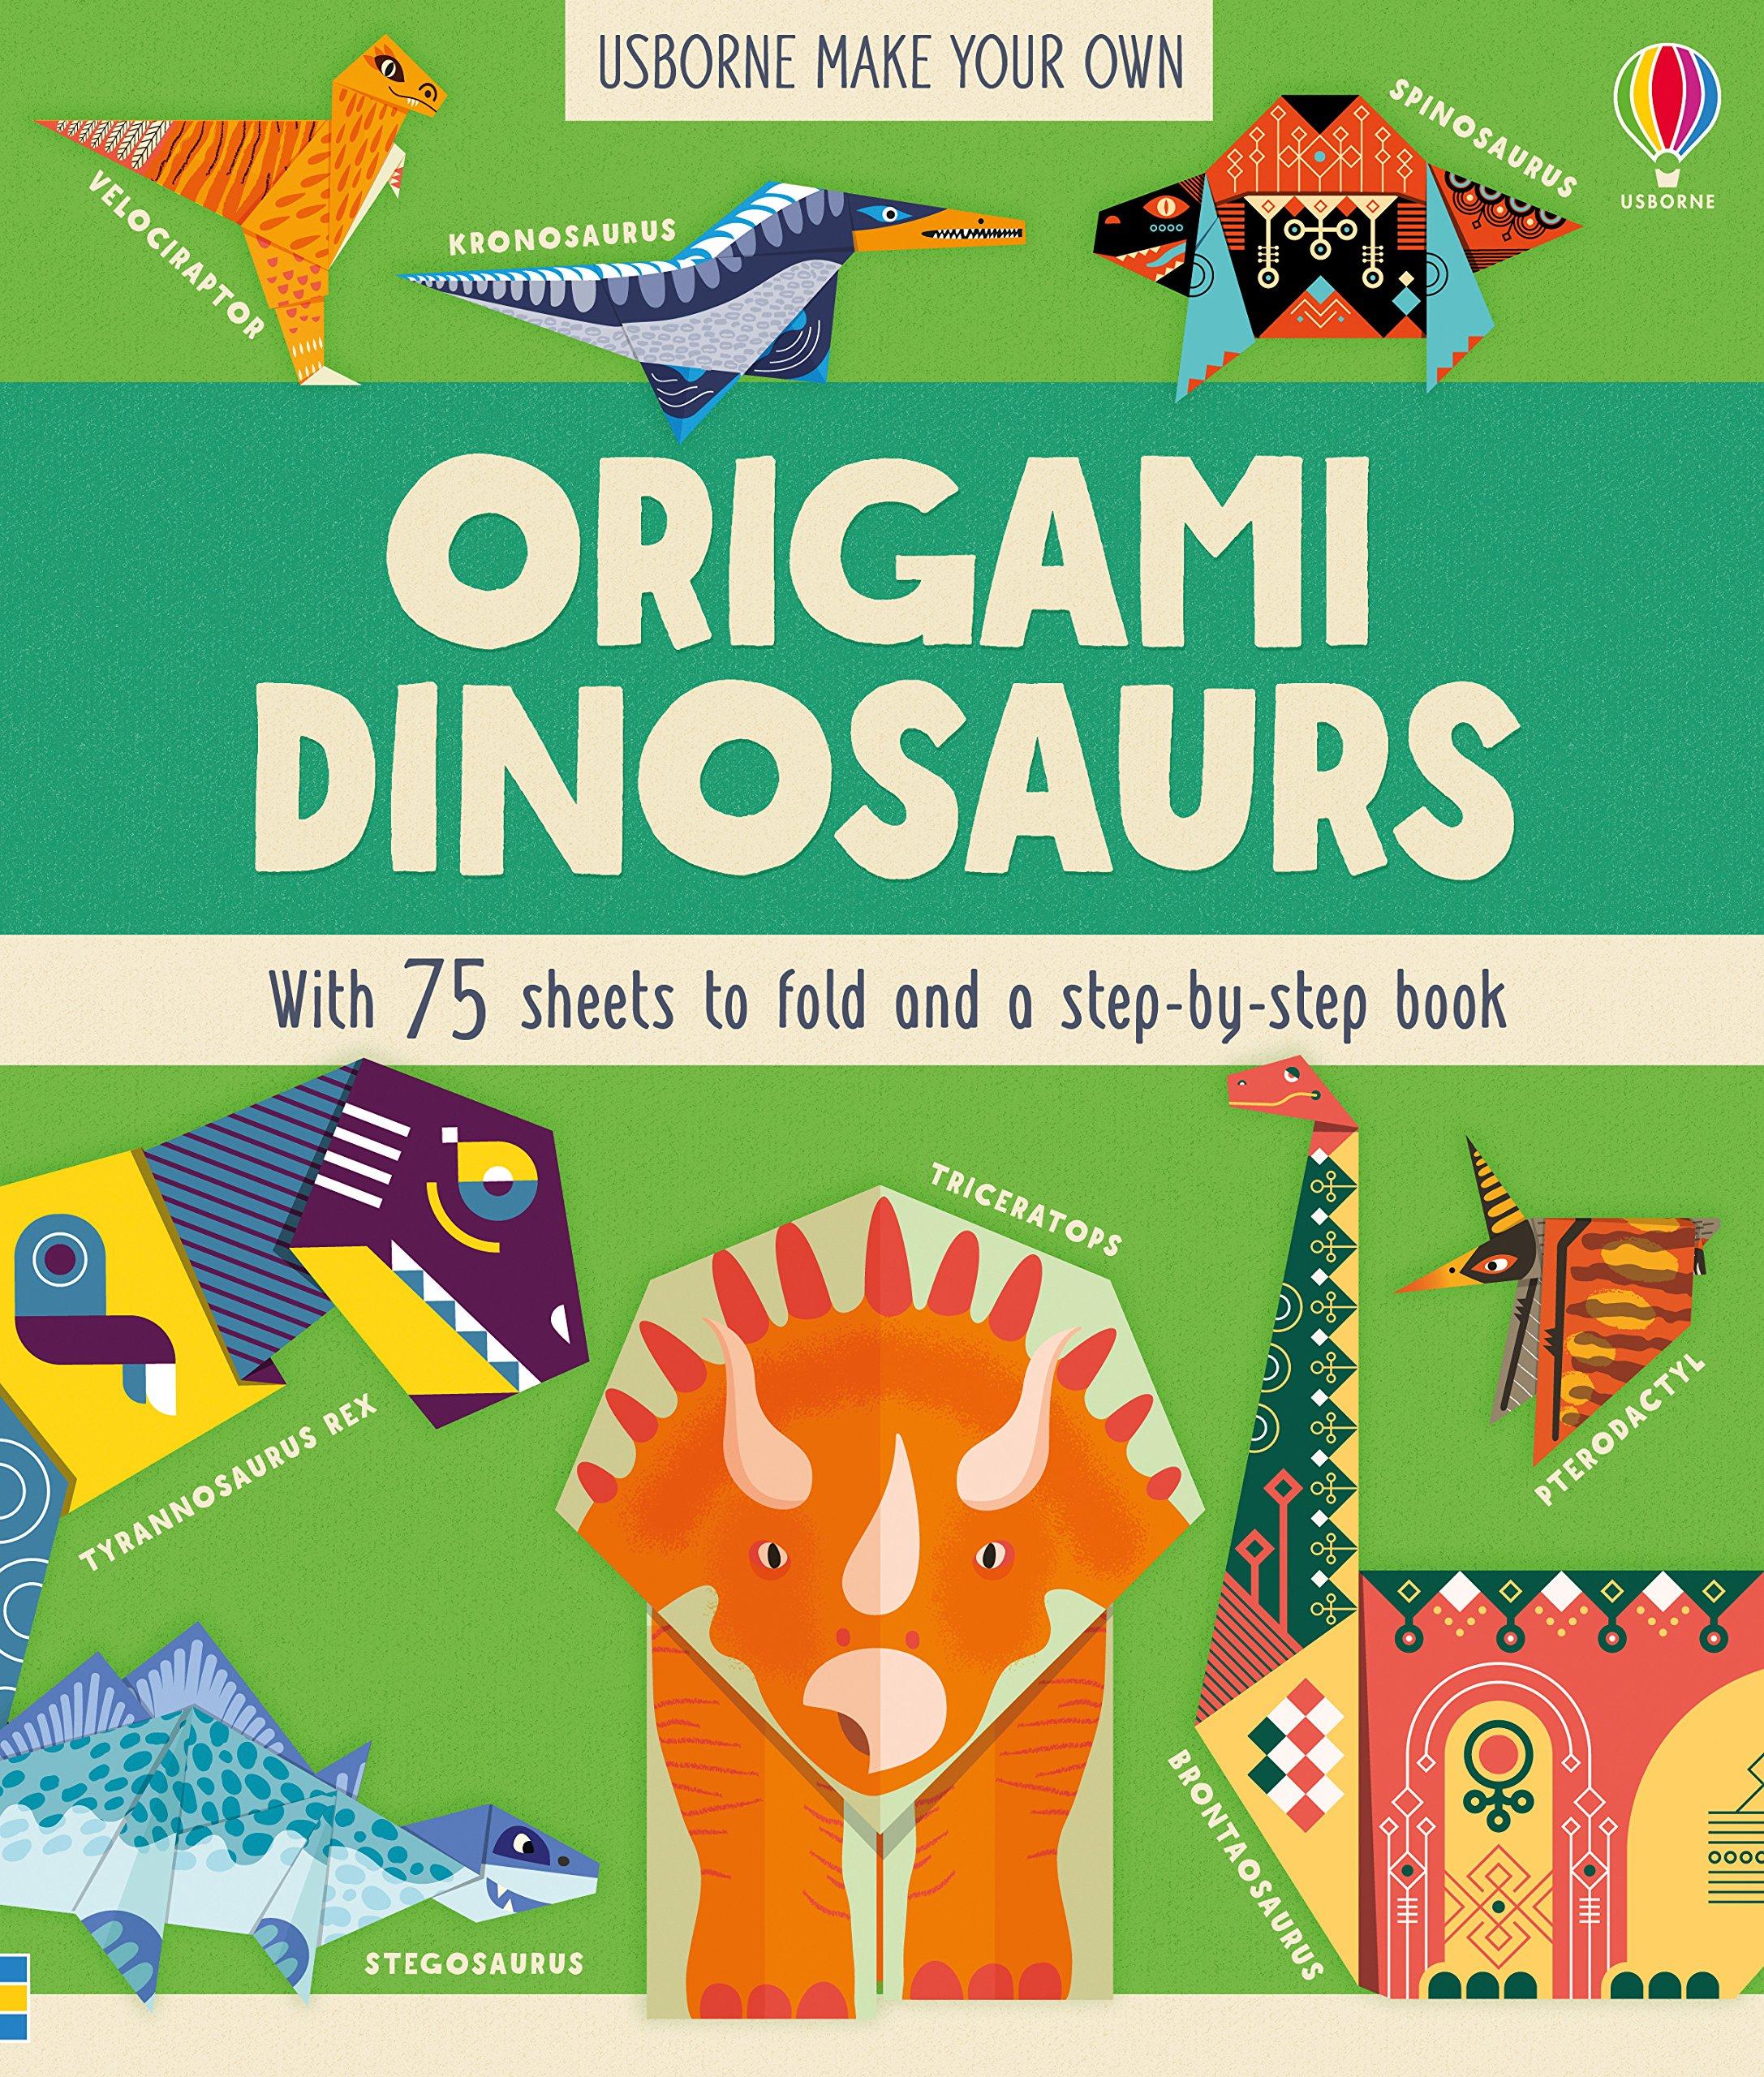 Origami Dinosaur Spinosaurus (How to make) - YouTube | 2560x2174